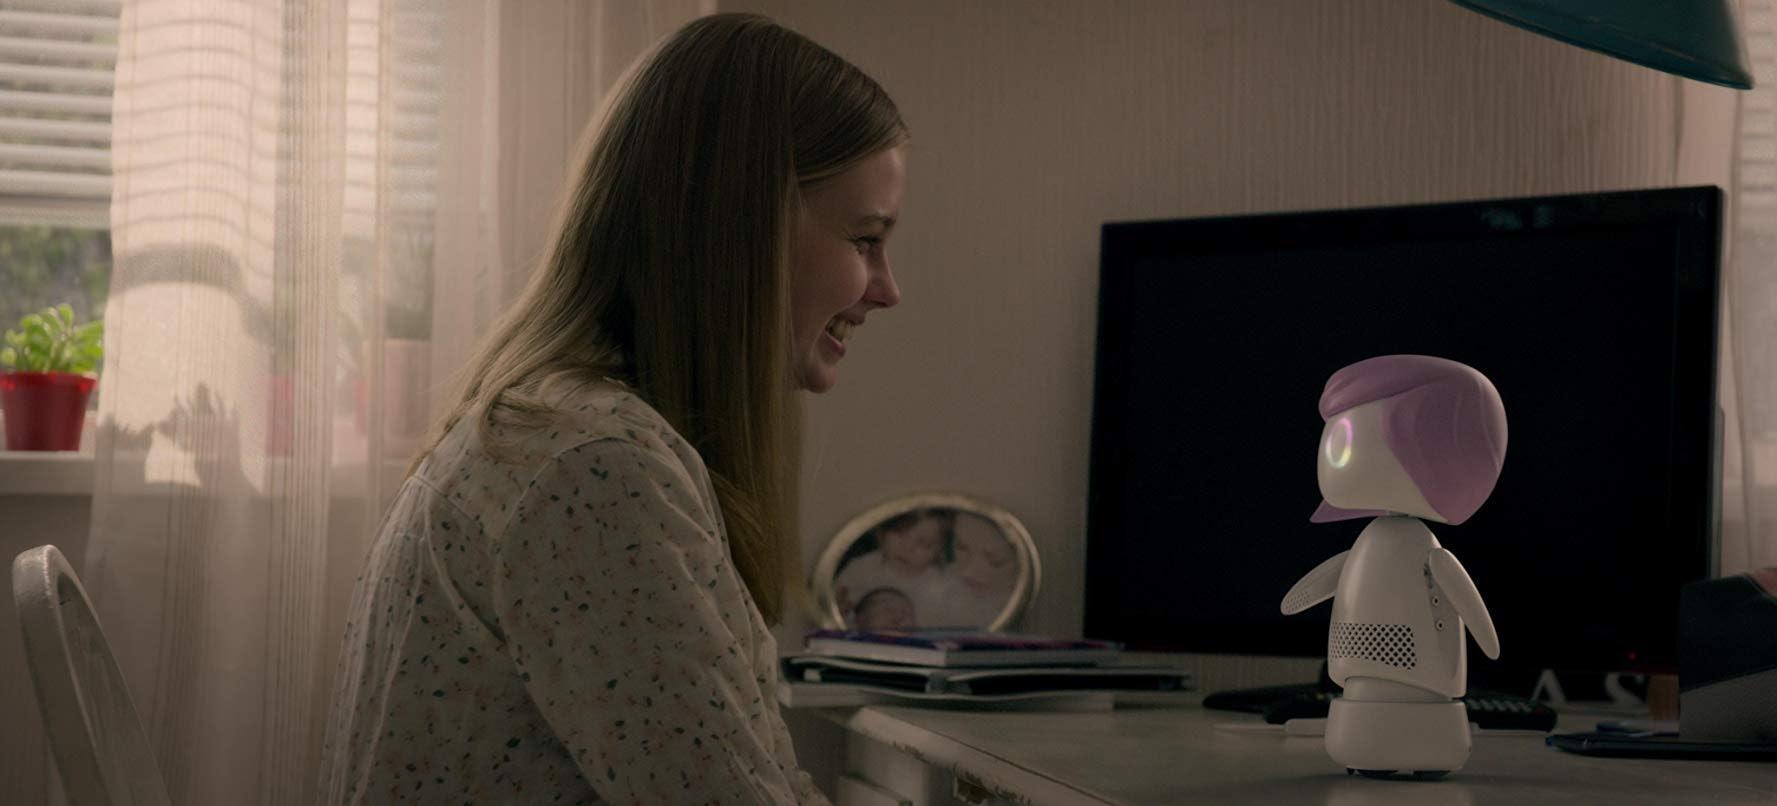 Angourie Rice stars in 'Black Mirror' Season 5.